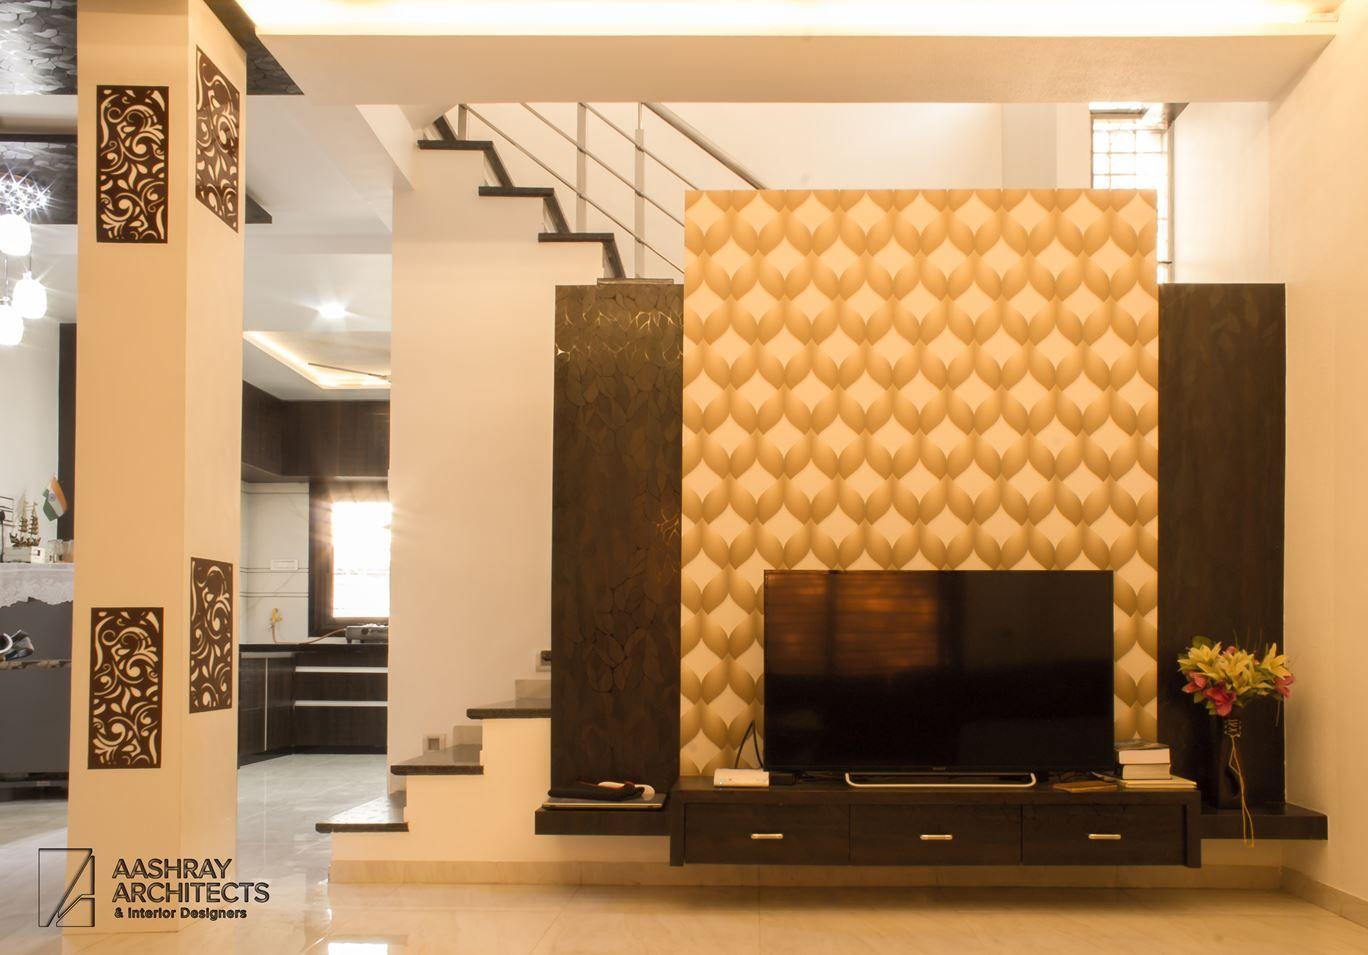 Interior design architect - Dinning Project Residence Interior Design Architect Pritesh Mori Location Surat